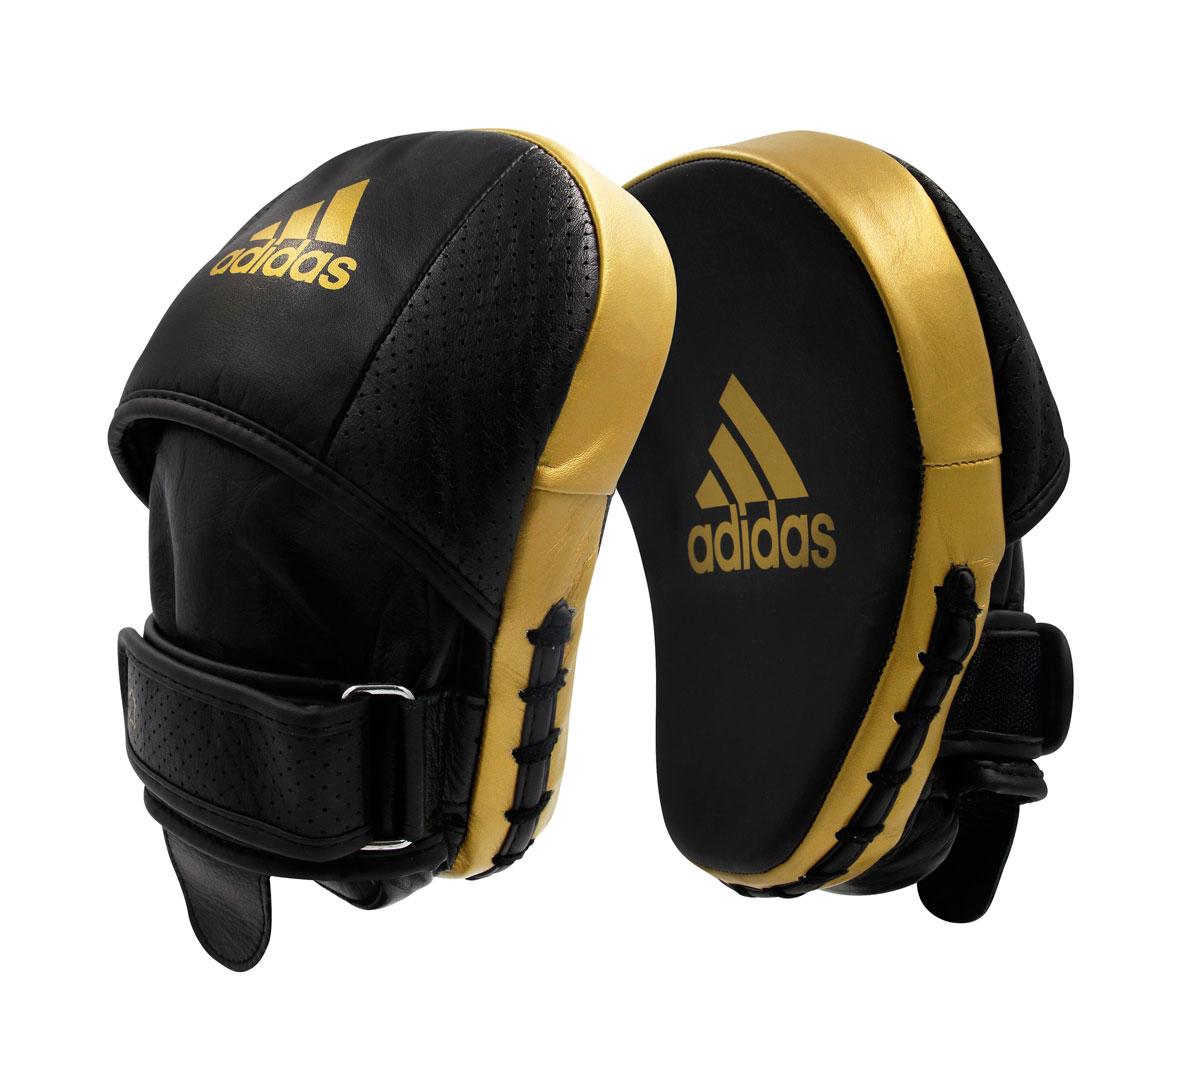 Лапы Adidas Pro Speed Focus Pad черно-золотые,  артикул adiPFP01PRO